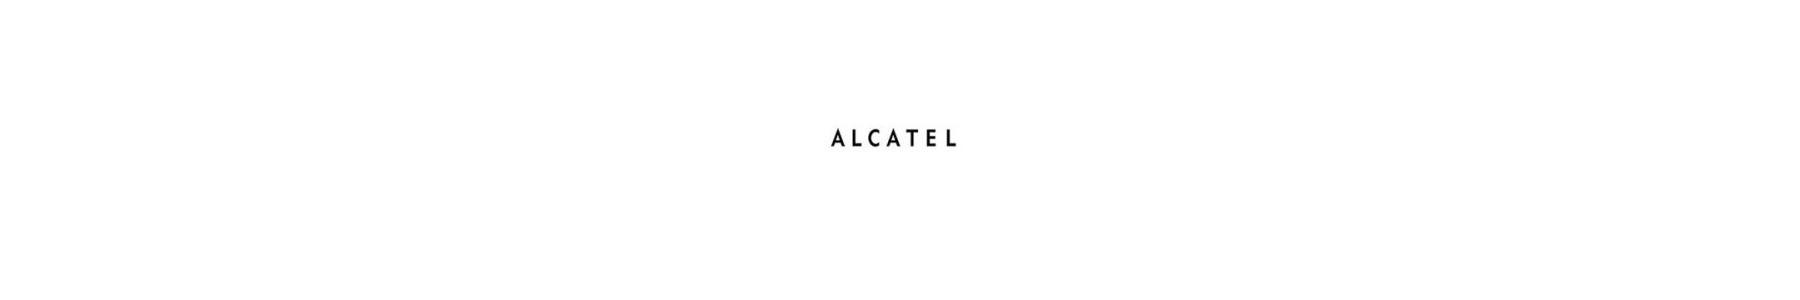 TELEFONI ANALOGICI ALCATEL